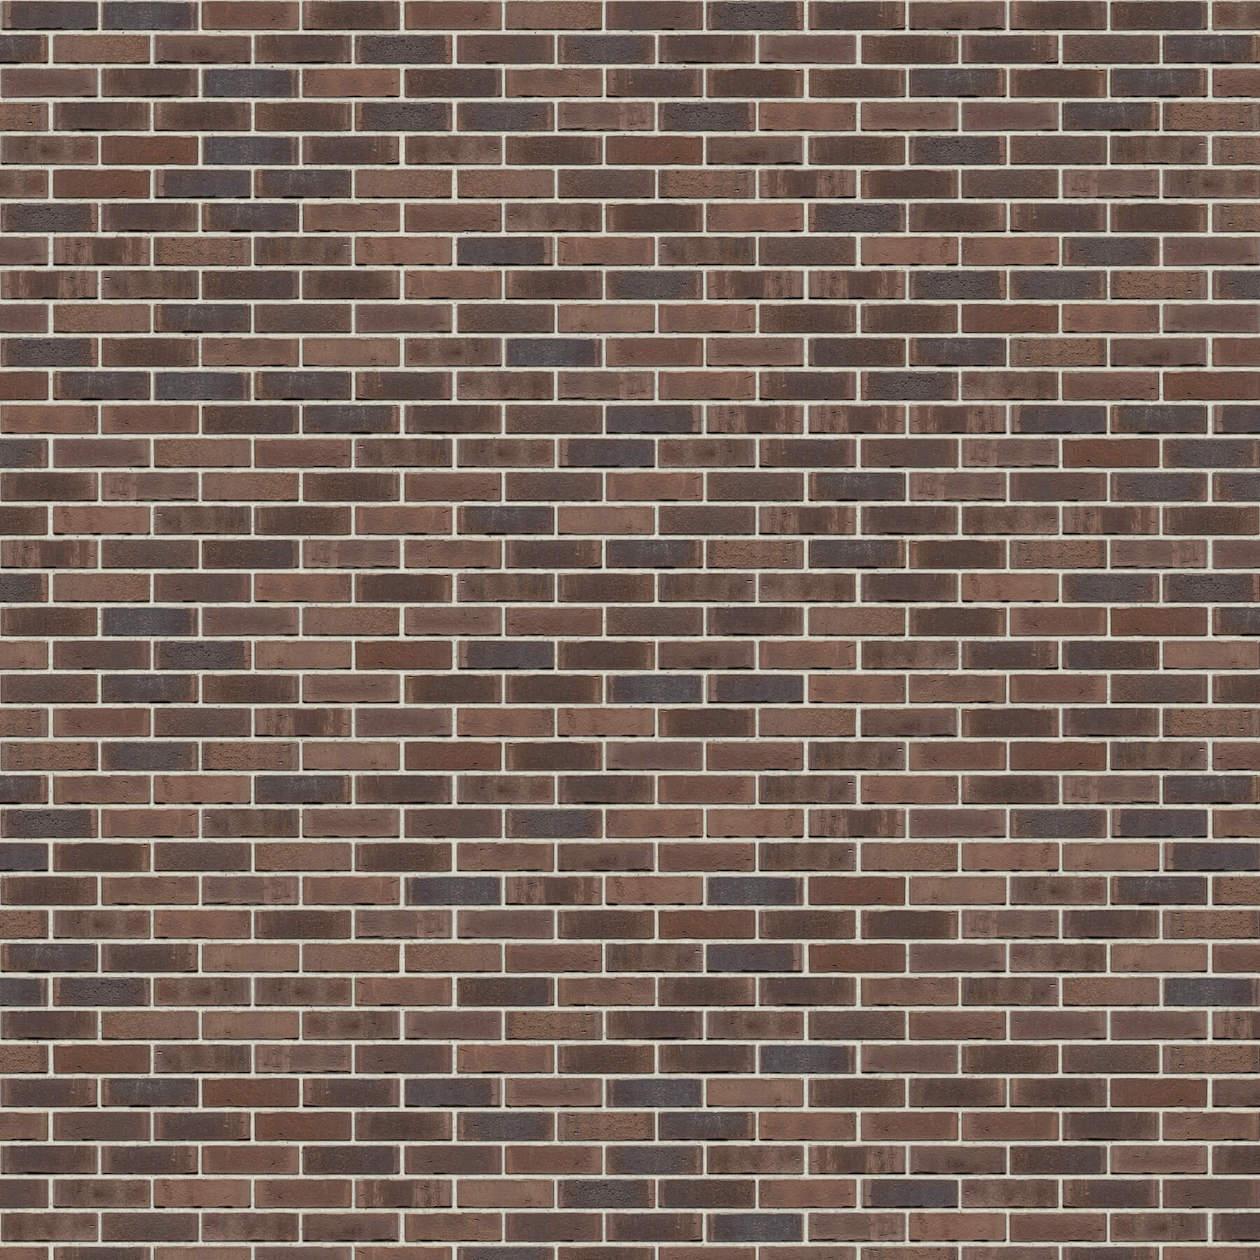 Puna-cigla-FeldHaus-Klinker-brick-house-nf-k-745-Bela Fuga